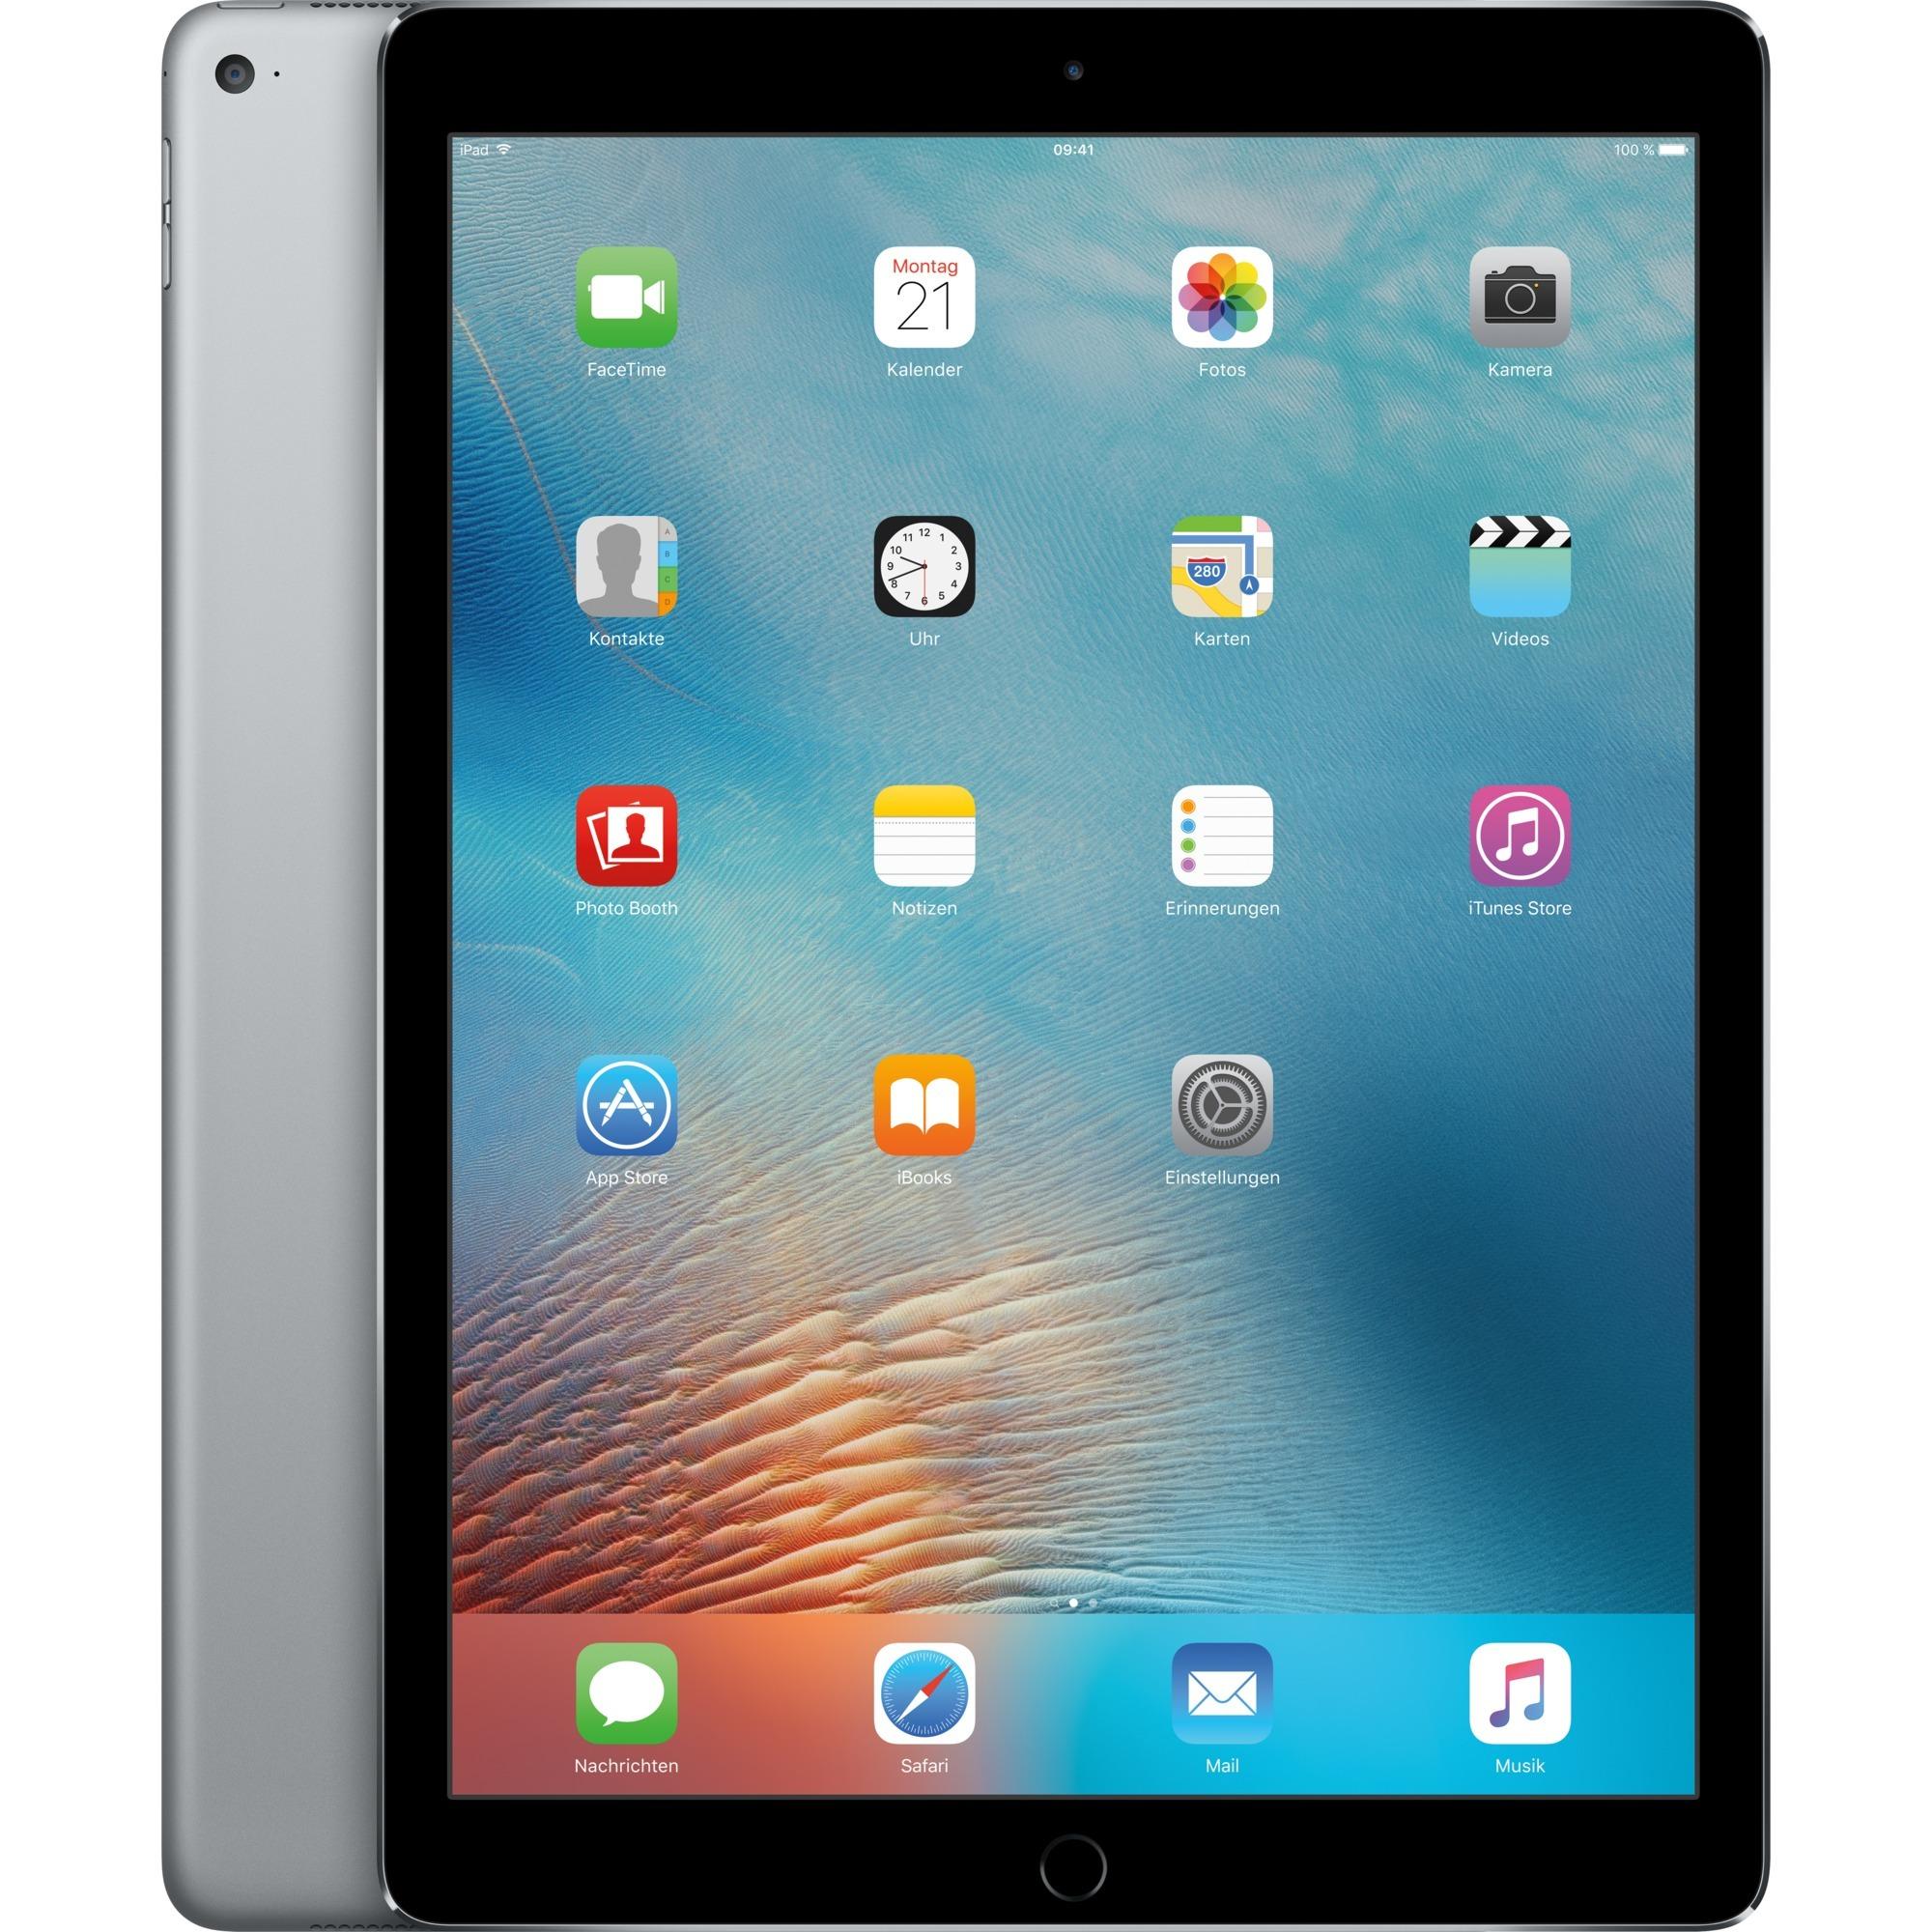 ipad pro 64go gris tablette tablette pc gwalarn uhel. Black Bedroom Furniture Sets. Home Design Ideas